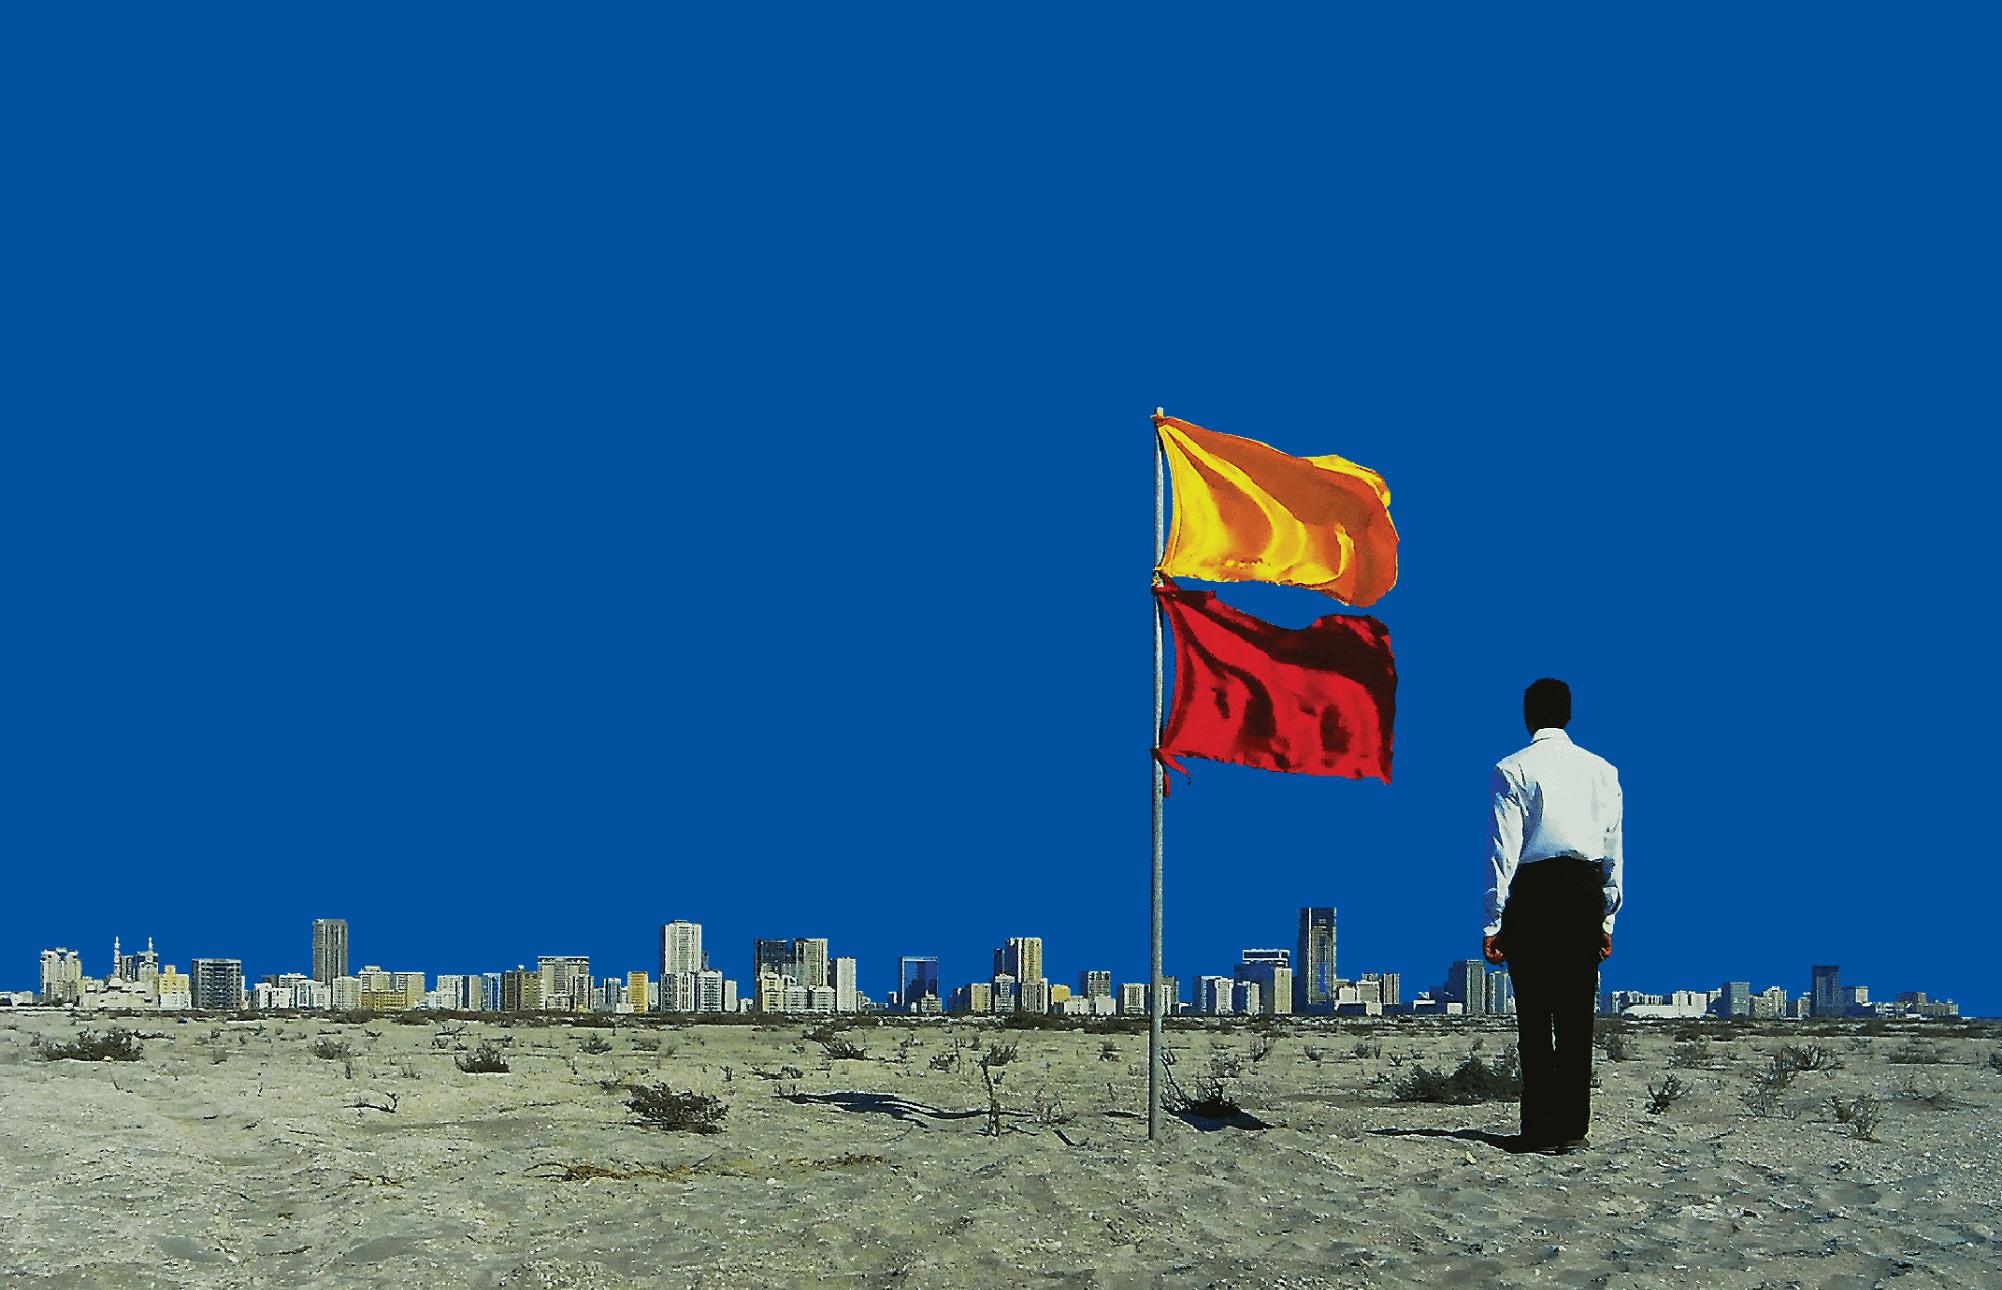 Mohammed Kazem, Autobiography 4, 1997. Sharjah Biennale 6